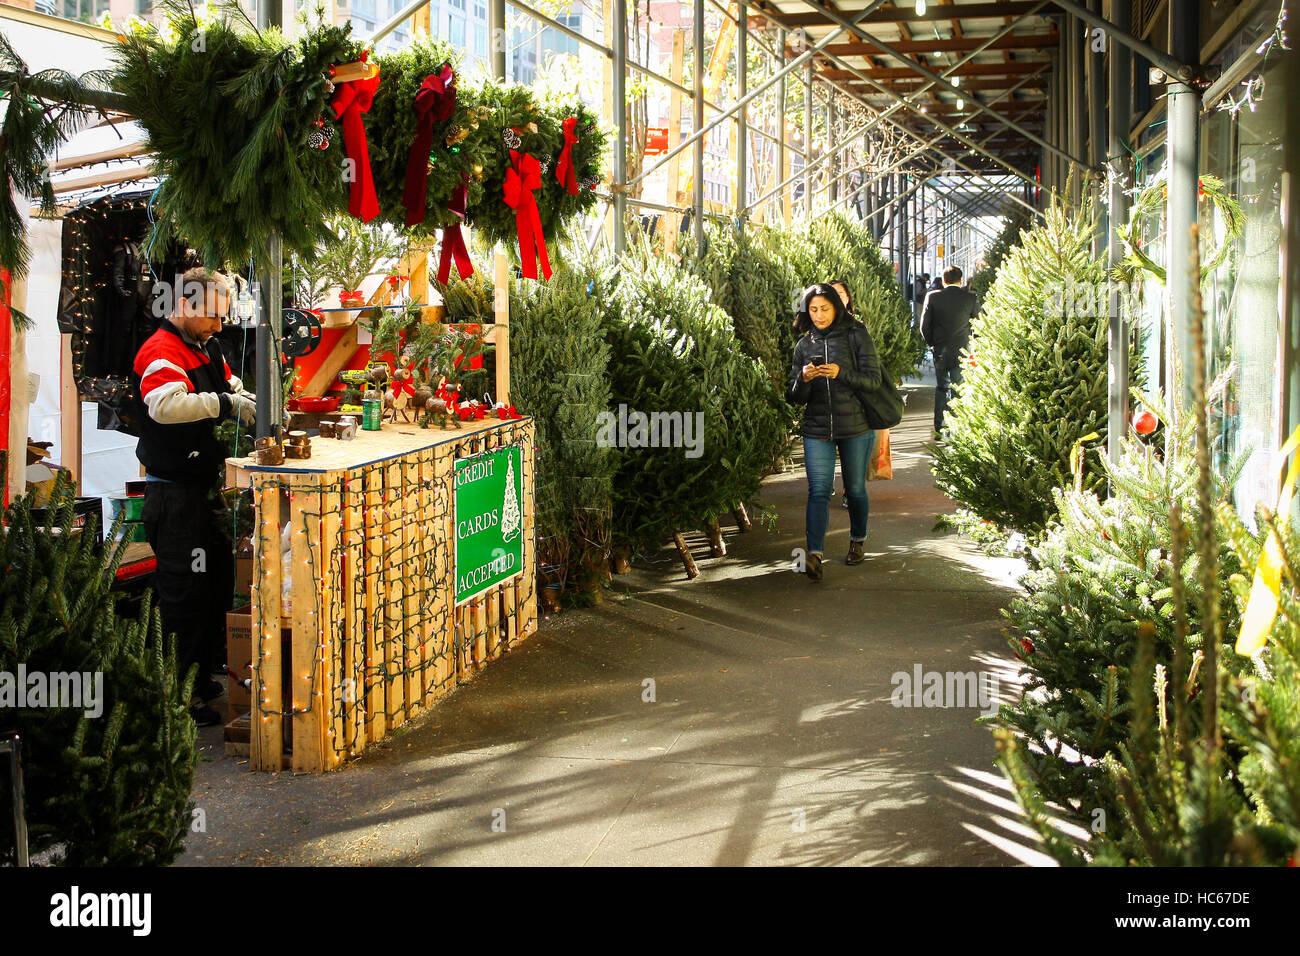 Nyc Christmas Tree Market Stock Photos & Nyc Christmas Tree Market ...